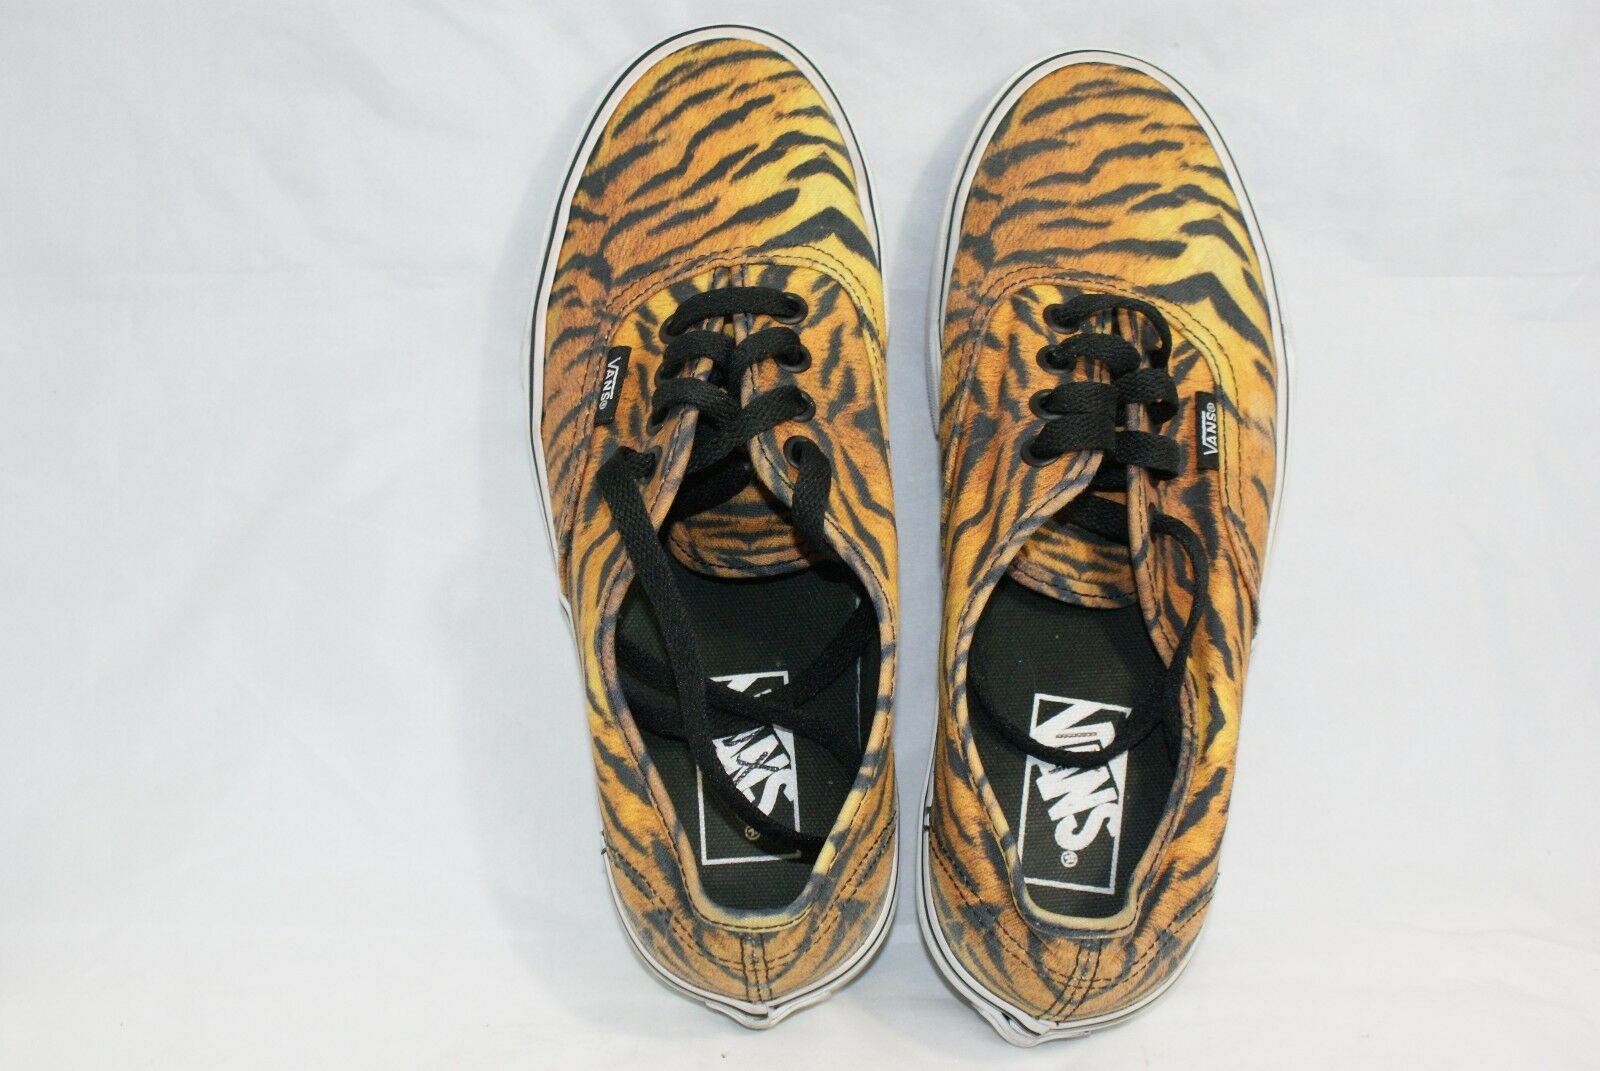 6a60c509c27 ... VANS Camo Black Yellow Yellow Yellow Canvas Skateboard Athletic Shoes  Men s 5.5 Women s 7 EUC 8142ae ...